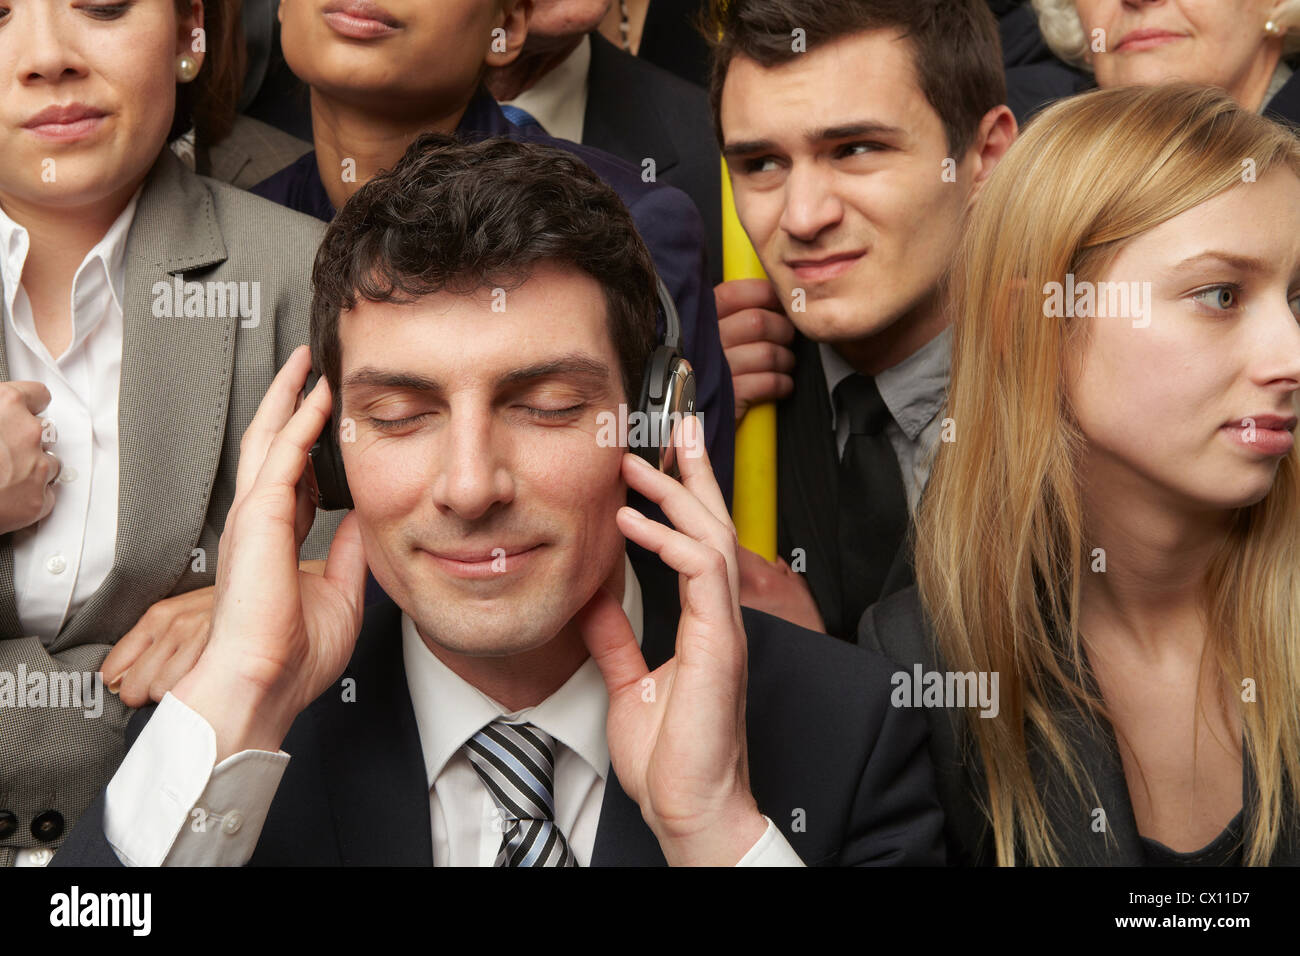 Businesswoman wearing headphones on subway train - Stock Image